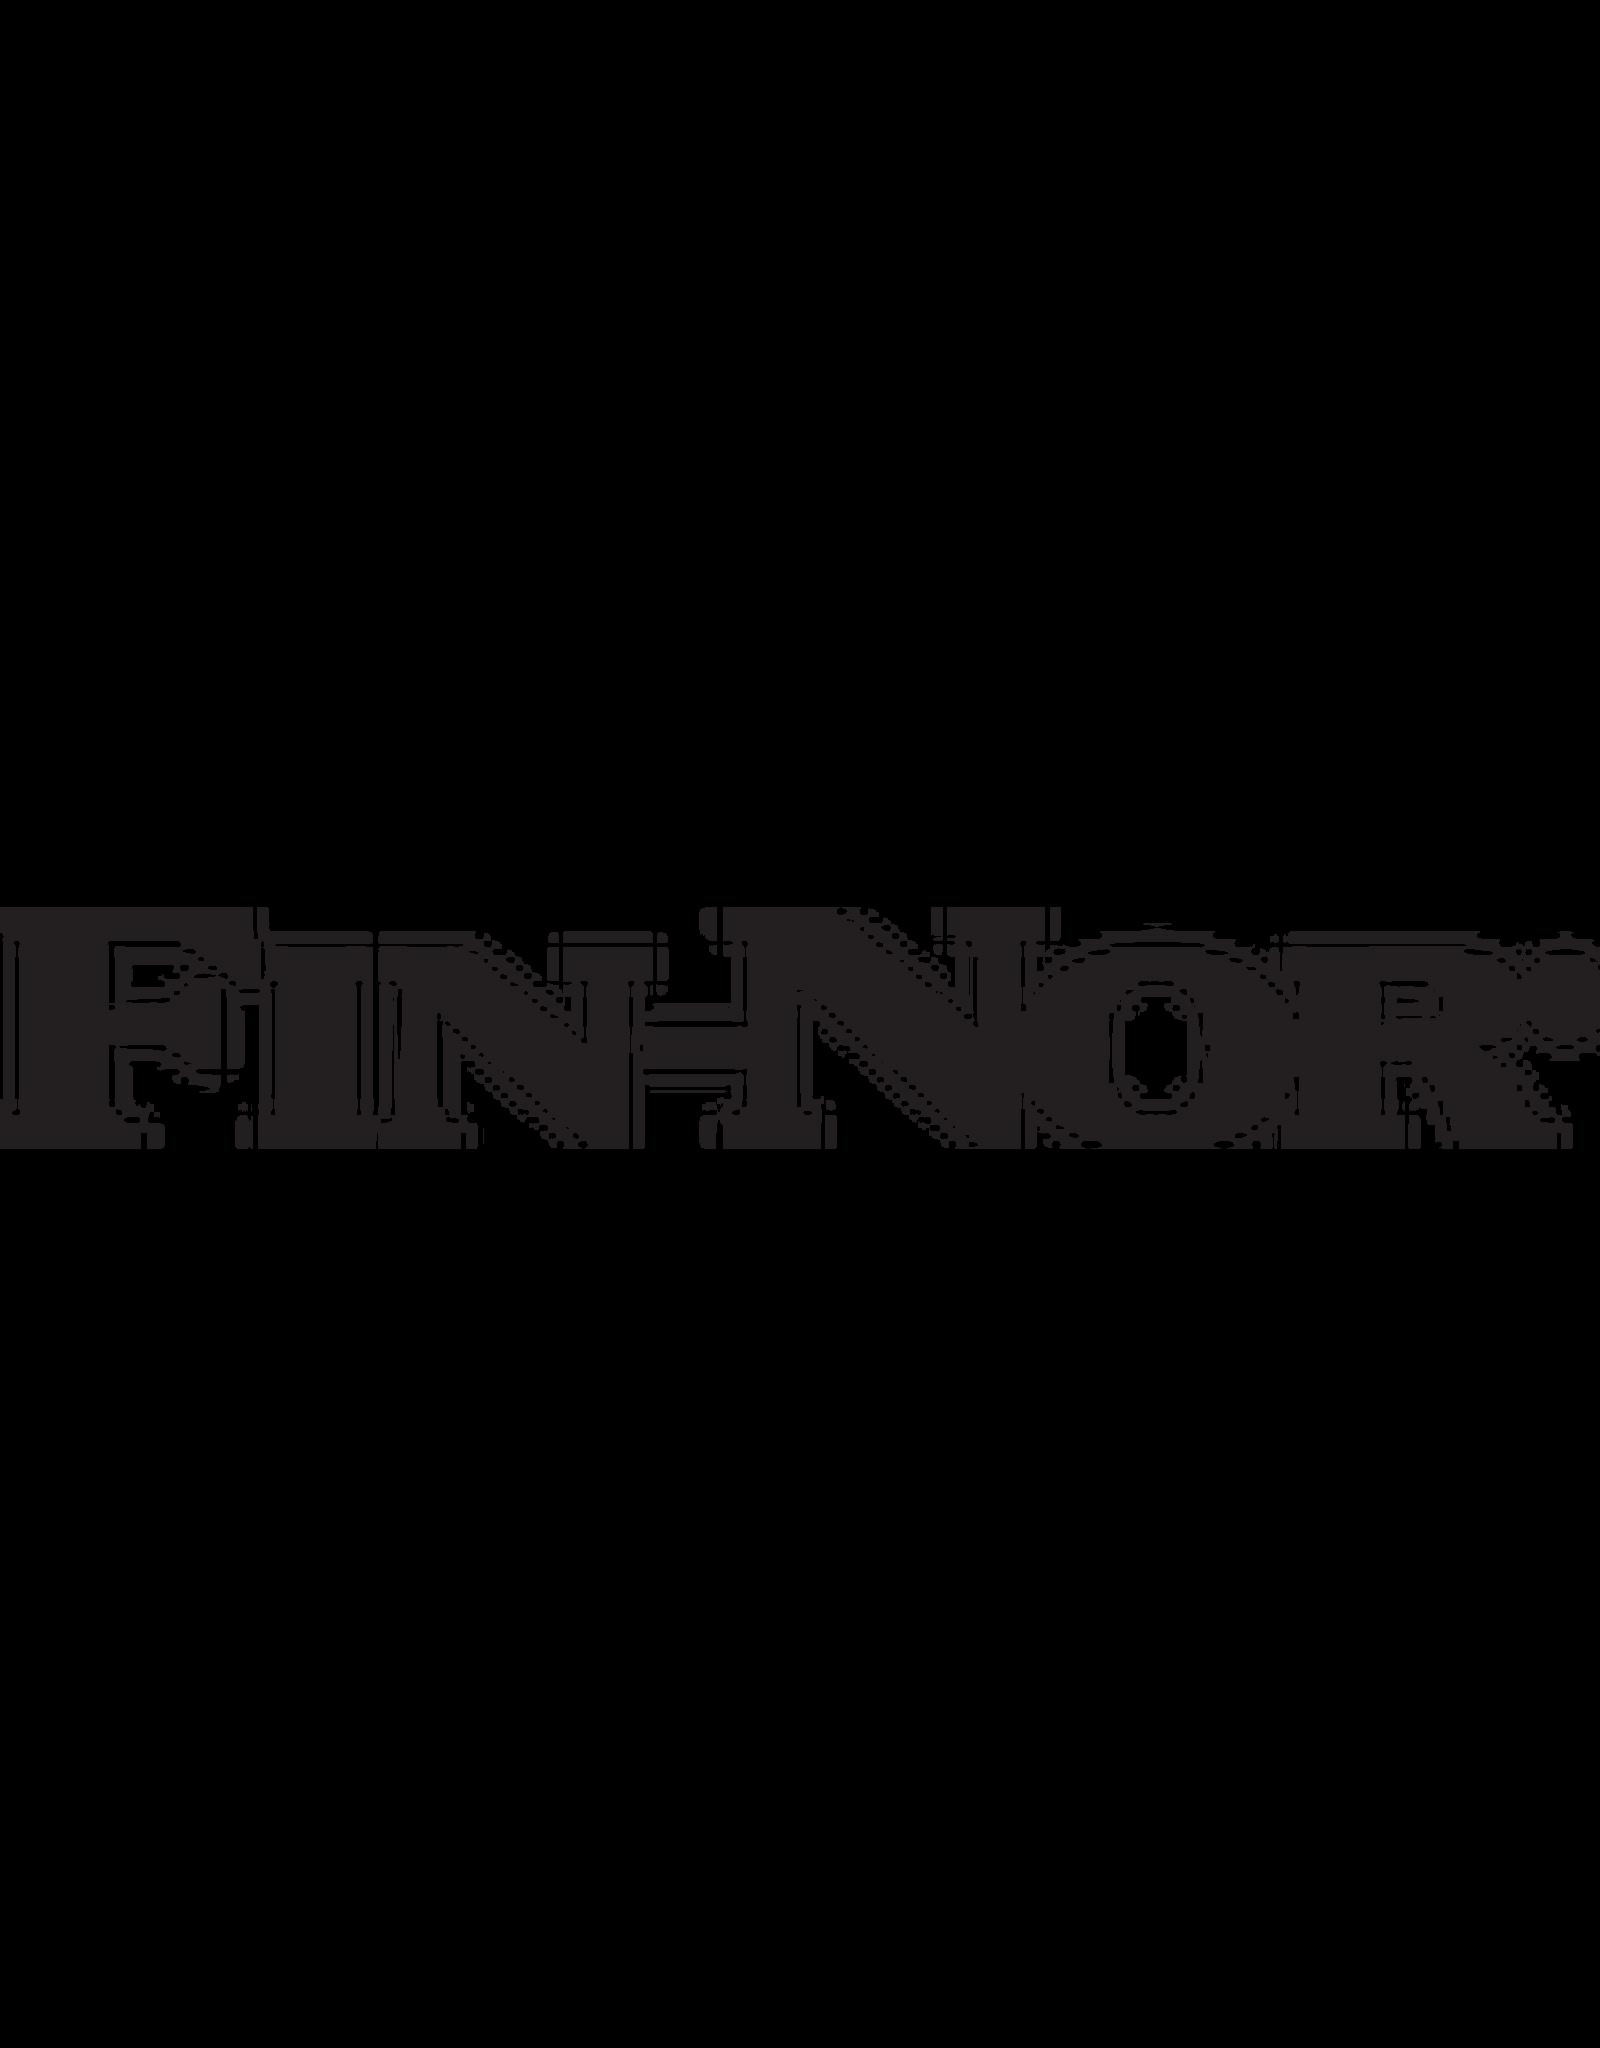 Fin-Nor BODY